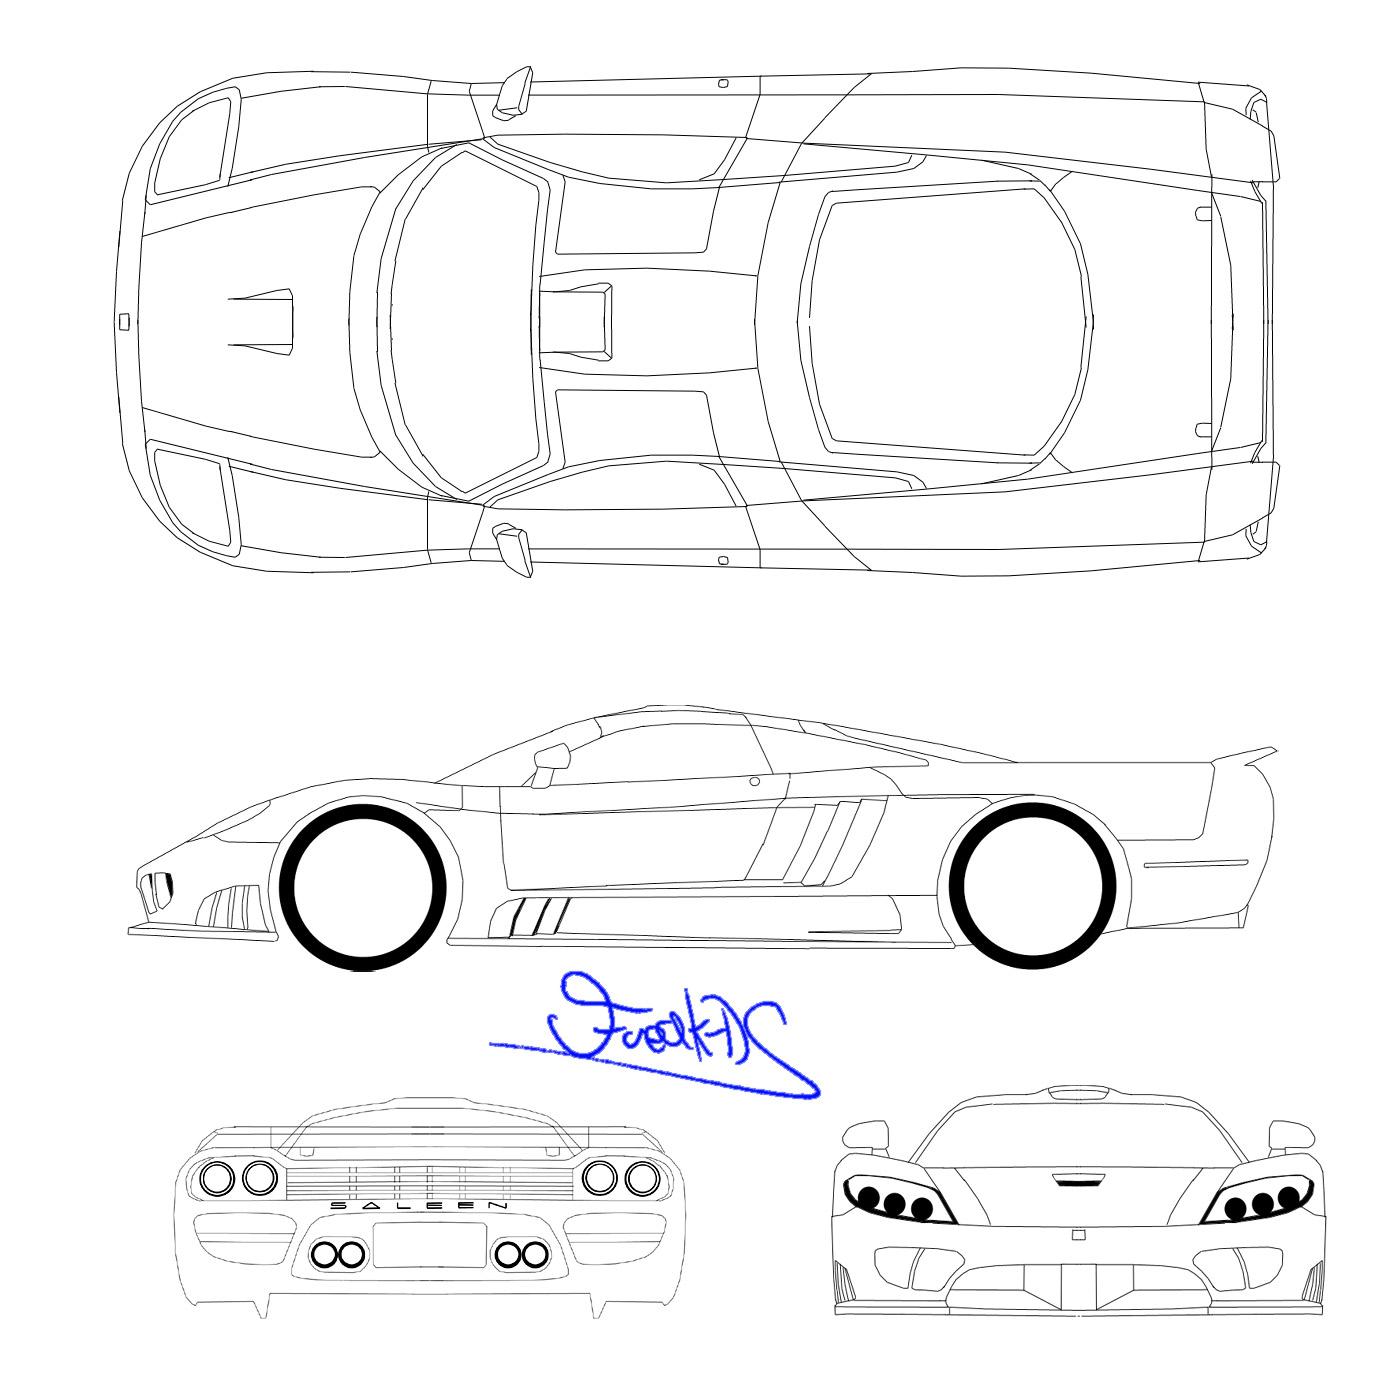 2000 saleen s7 coupe blueprints free